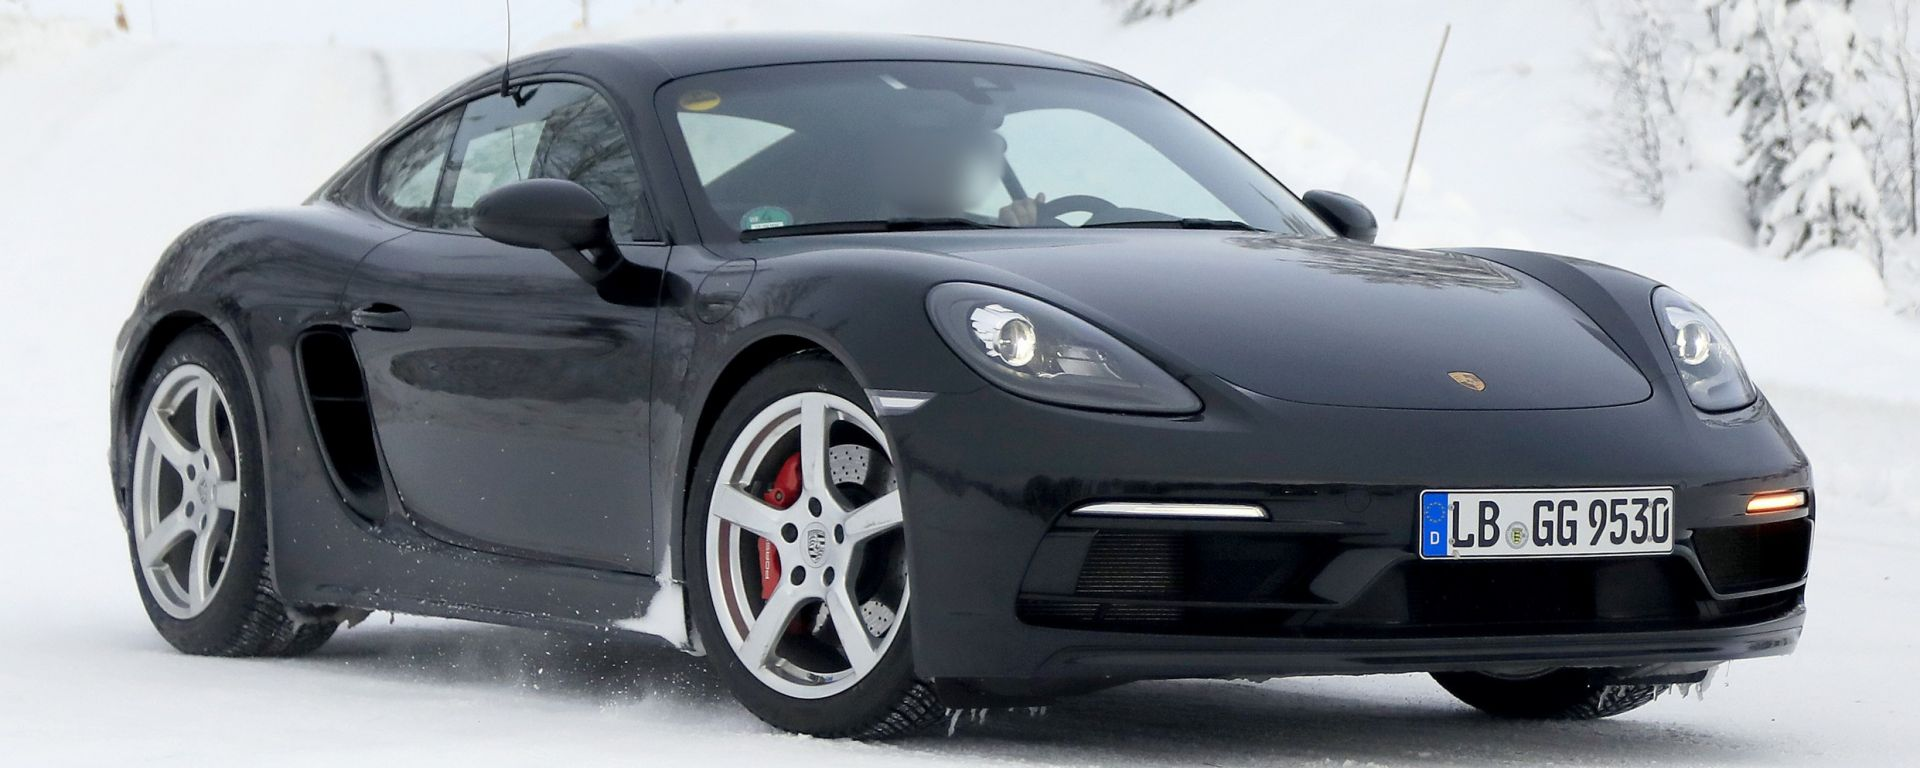 Porsche 718 GT4 Touring Package: le foto spia durante i test